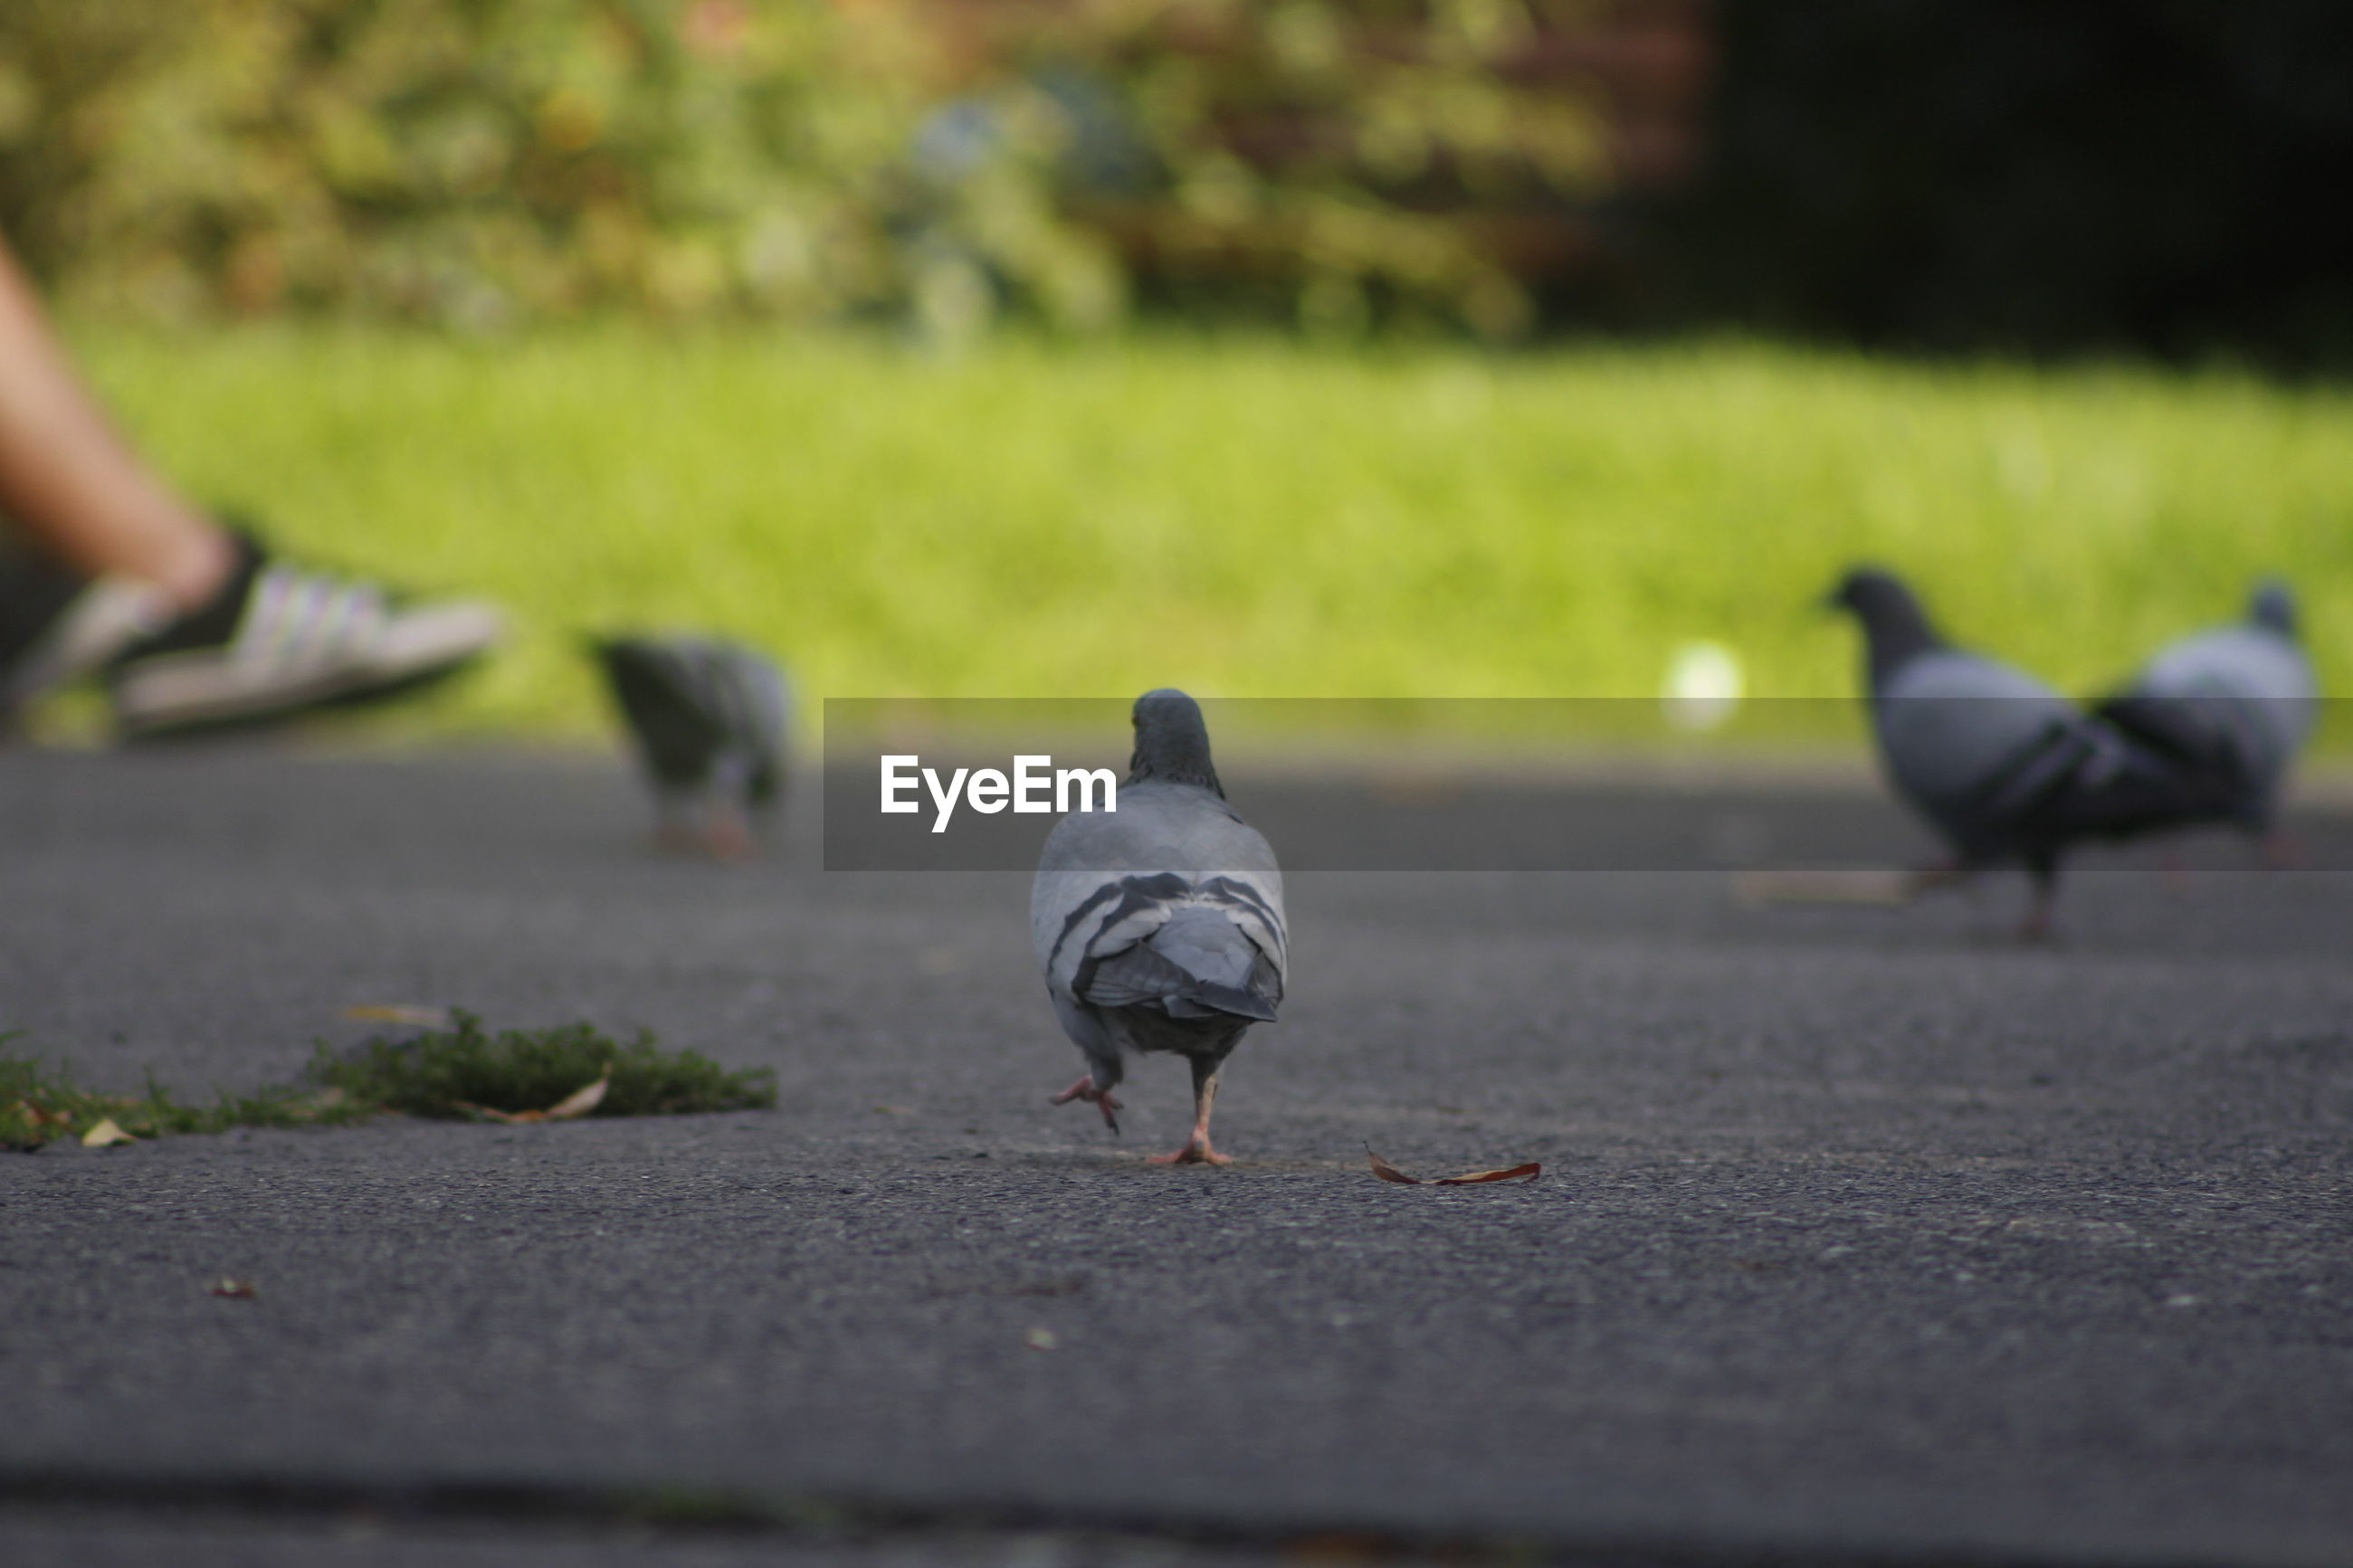 Pigeons on footpath in park